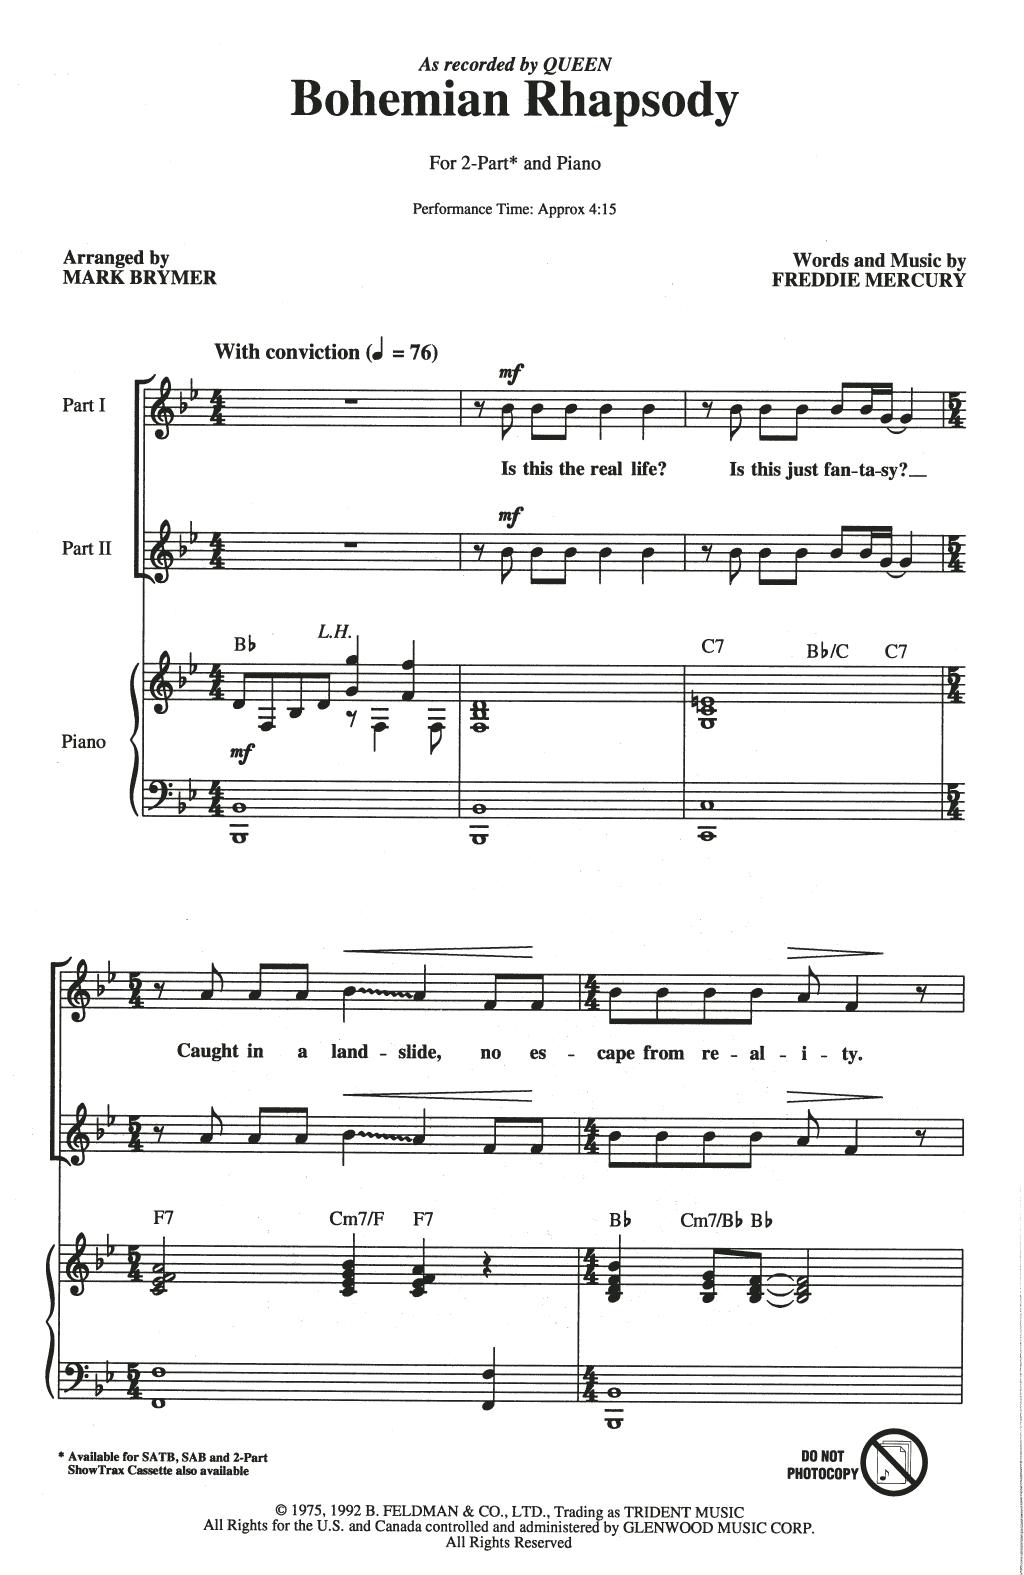 Bohemian Rhapsody (arr. Mark Brymer) (2-Part Choir)